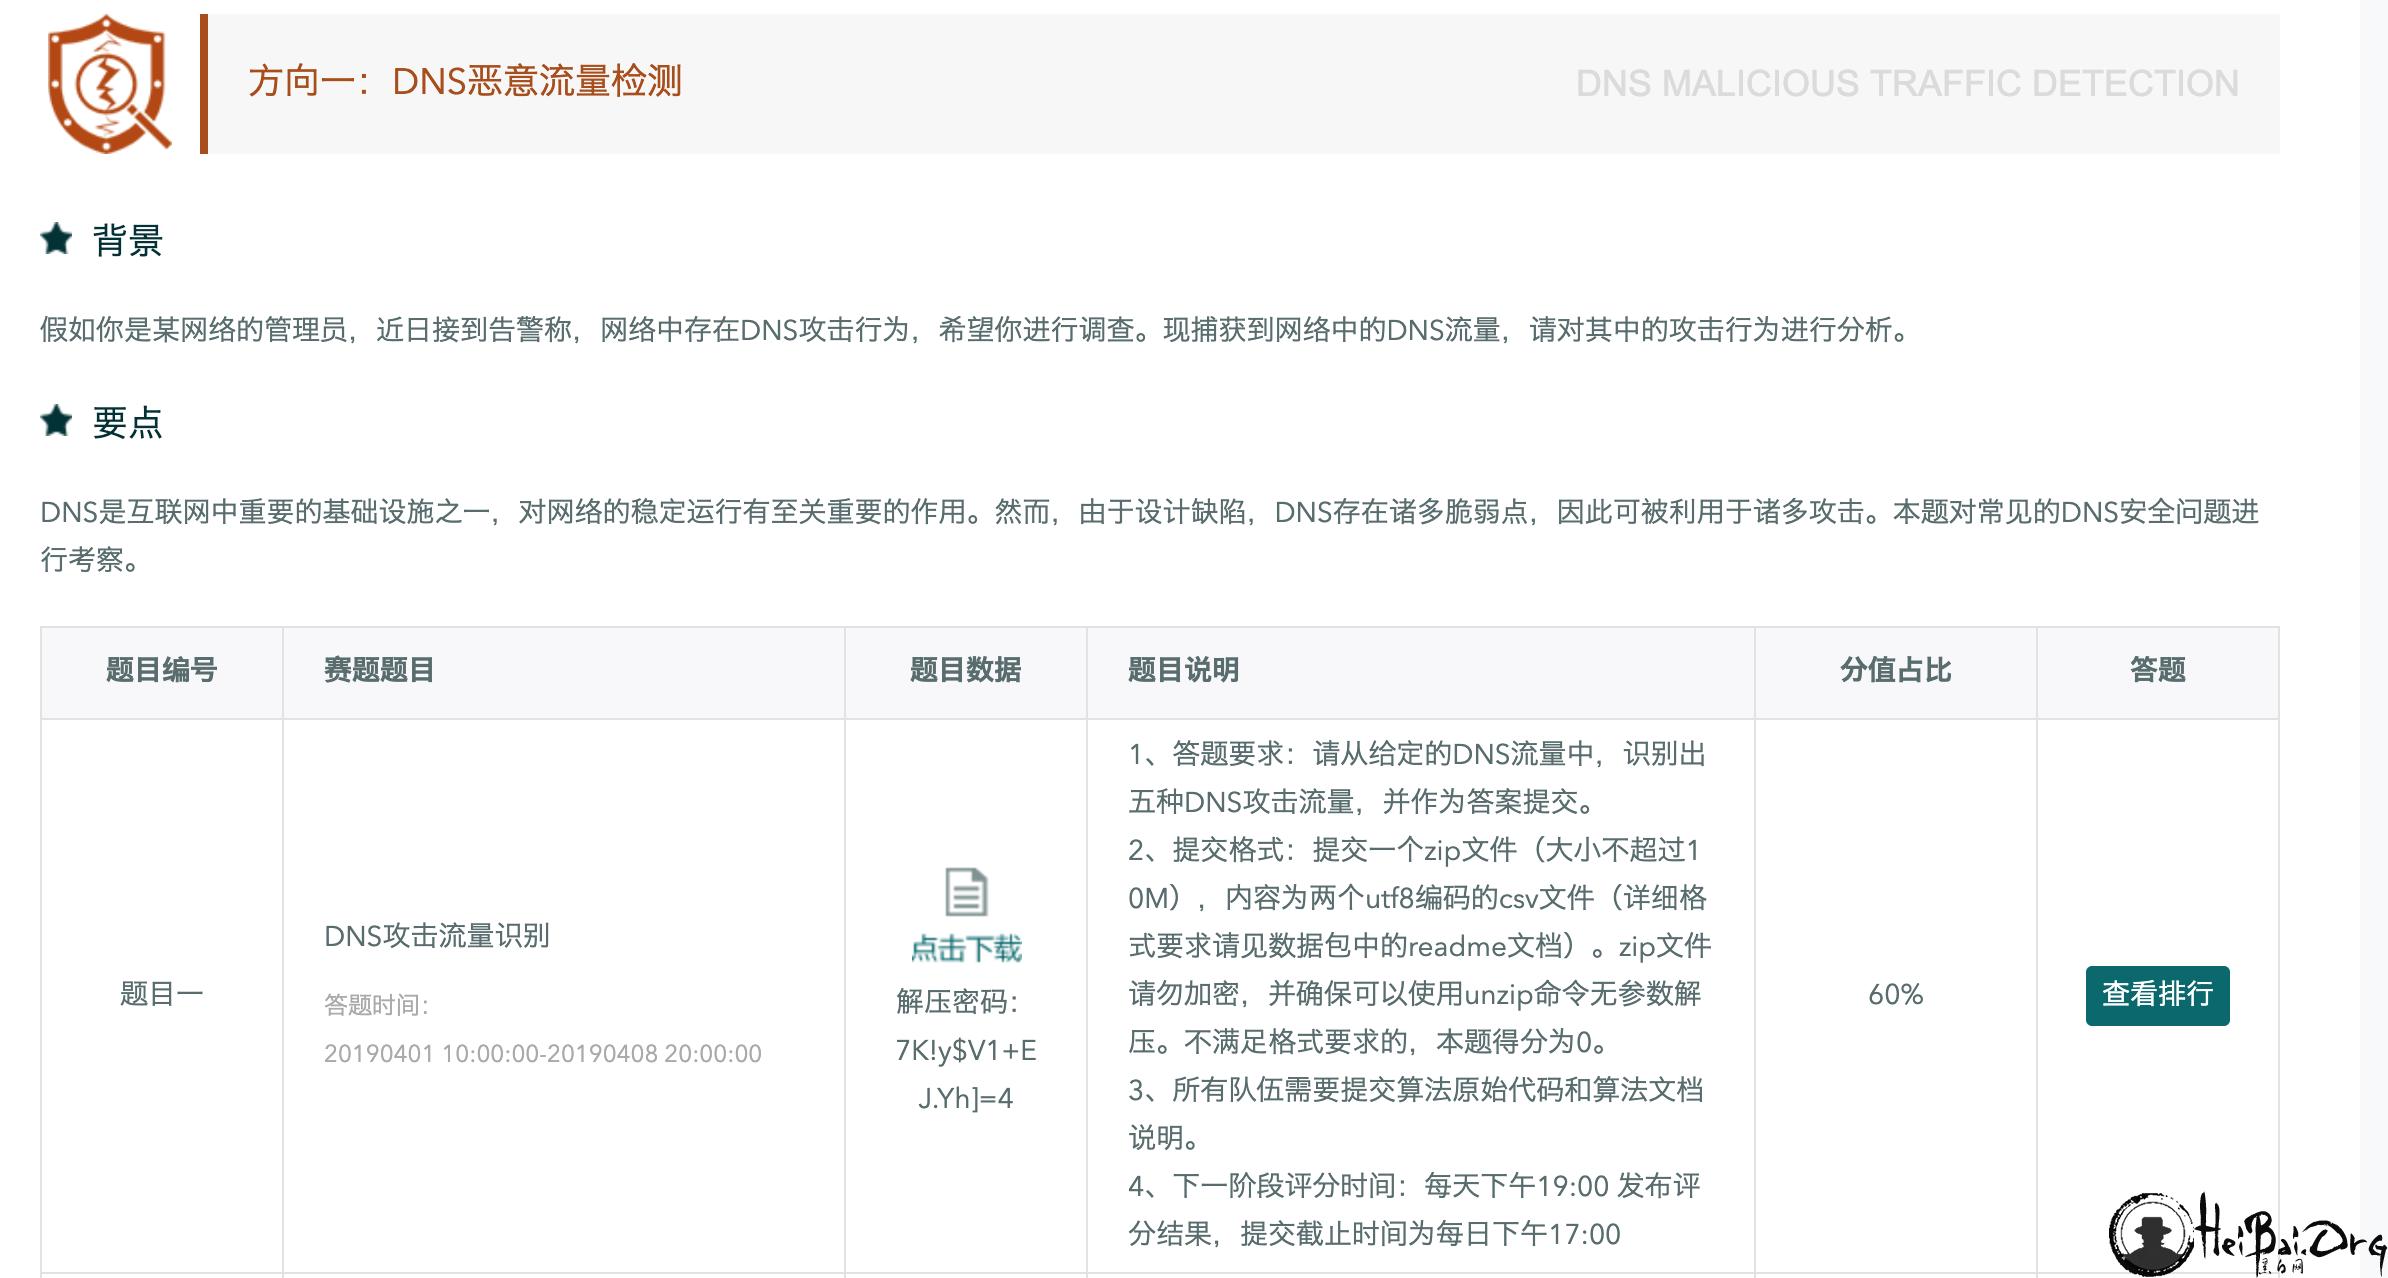 Datacon DNS攻击流量识别 内测笔记